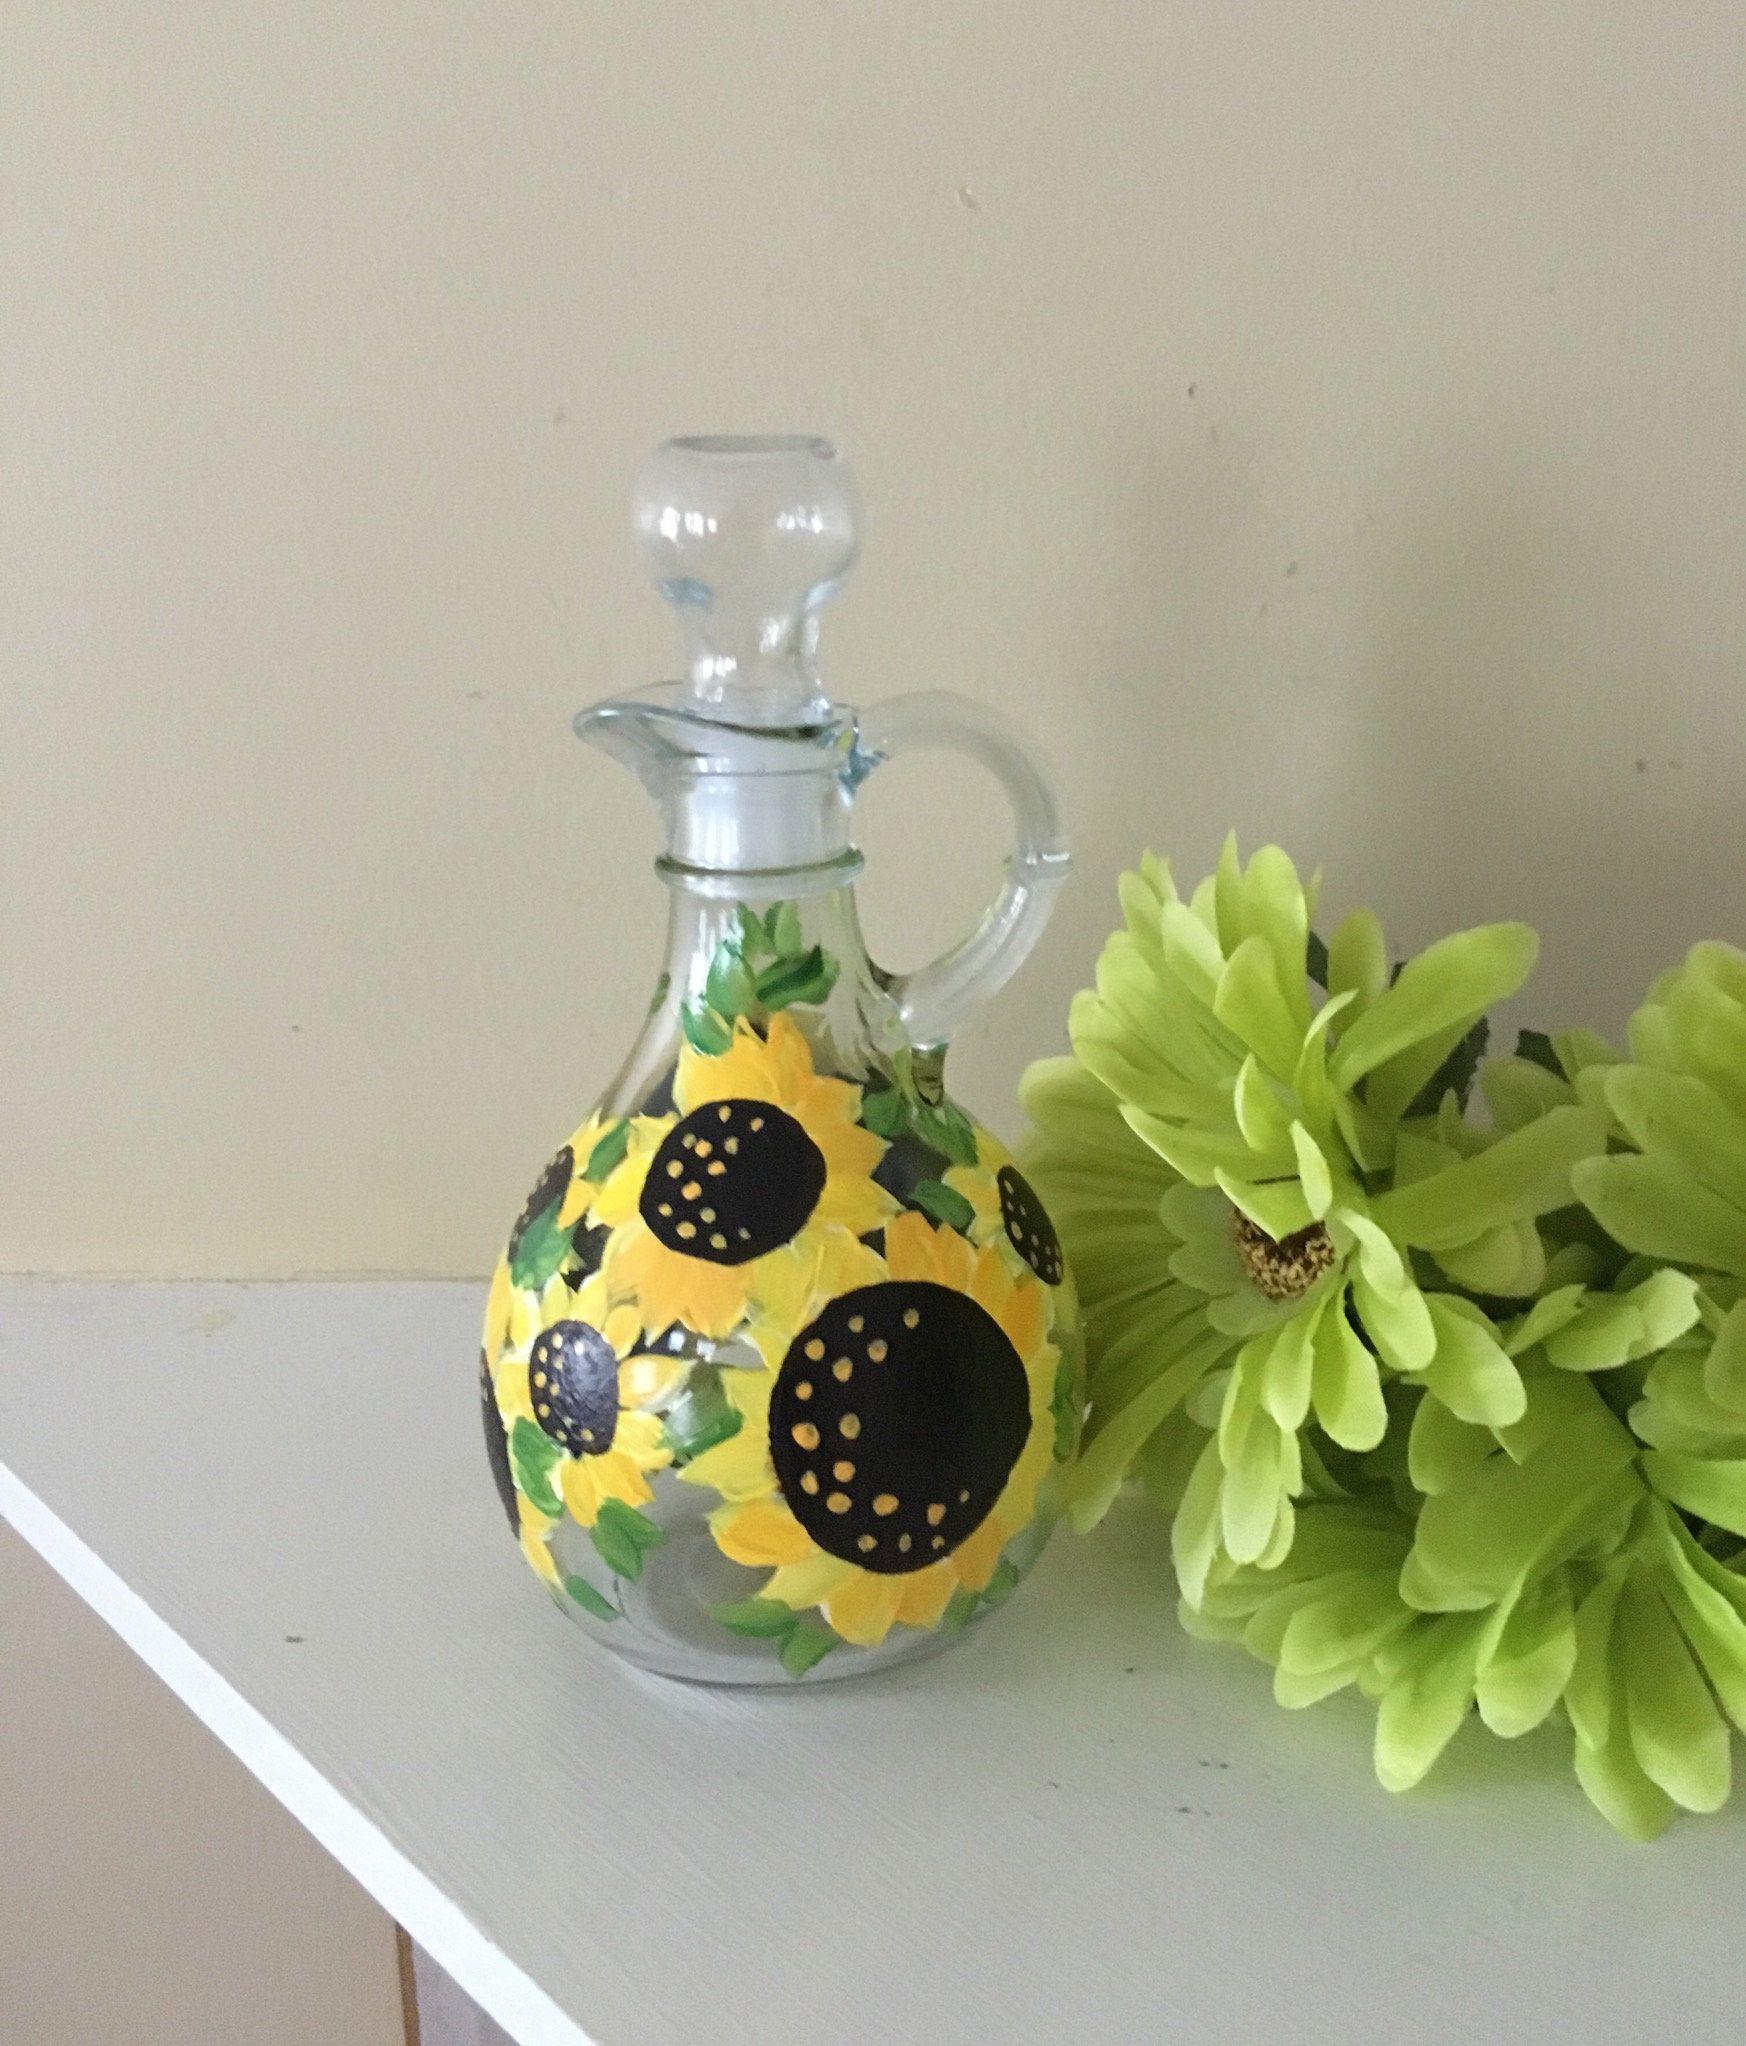 Sunflower Oil Bottle, Oil and Vinegar Cruet, Autumn dish ware, Fall Decor, Hand Painted Bottle, Thanksgiving Serving Dish #dishware